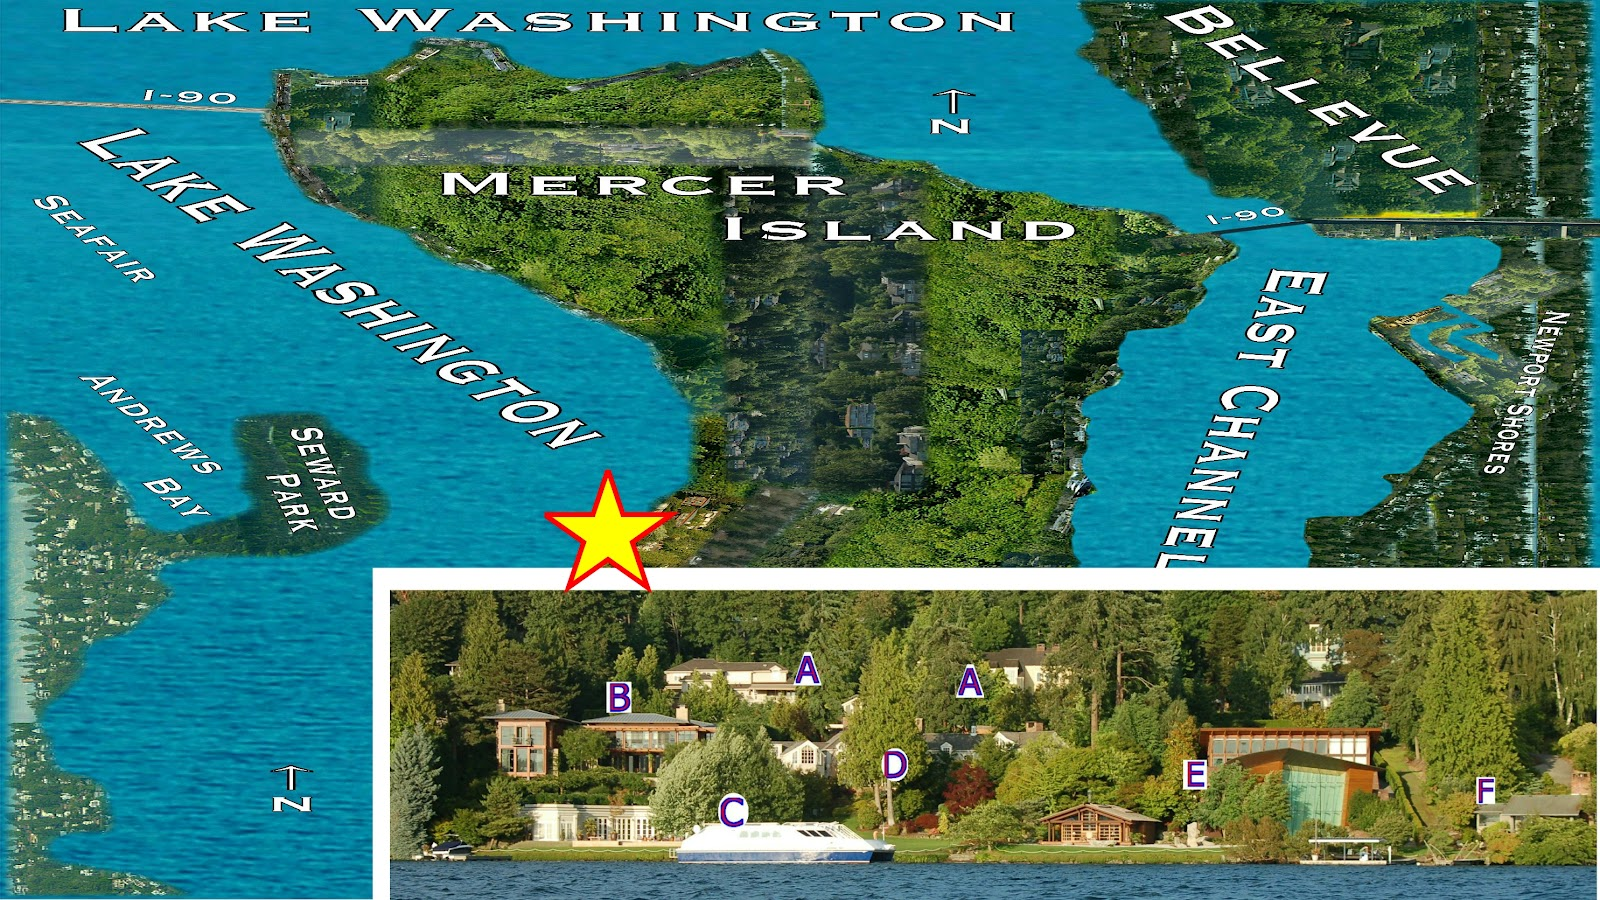 Mercer island luxury waterfront estate idesignarch interior design - Lake Washington Cruising Paul Allen Viewing Mercer Island Campus